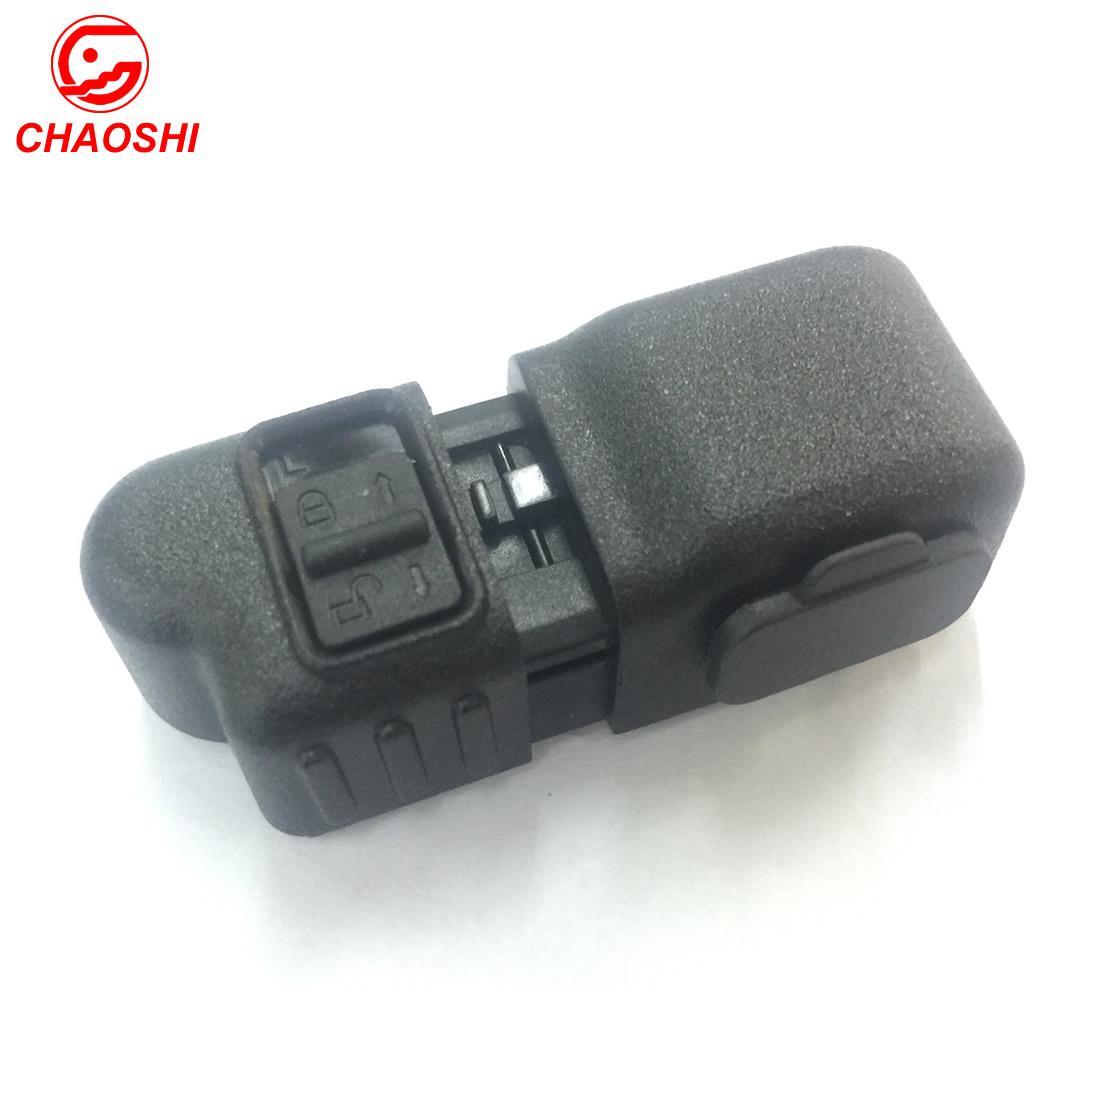 Audio adaptor for DEP550, XPR3550, DP2400 3